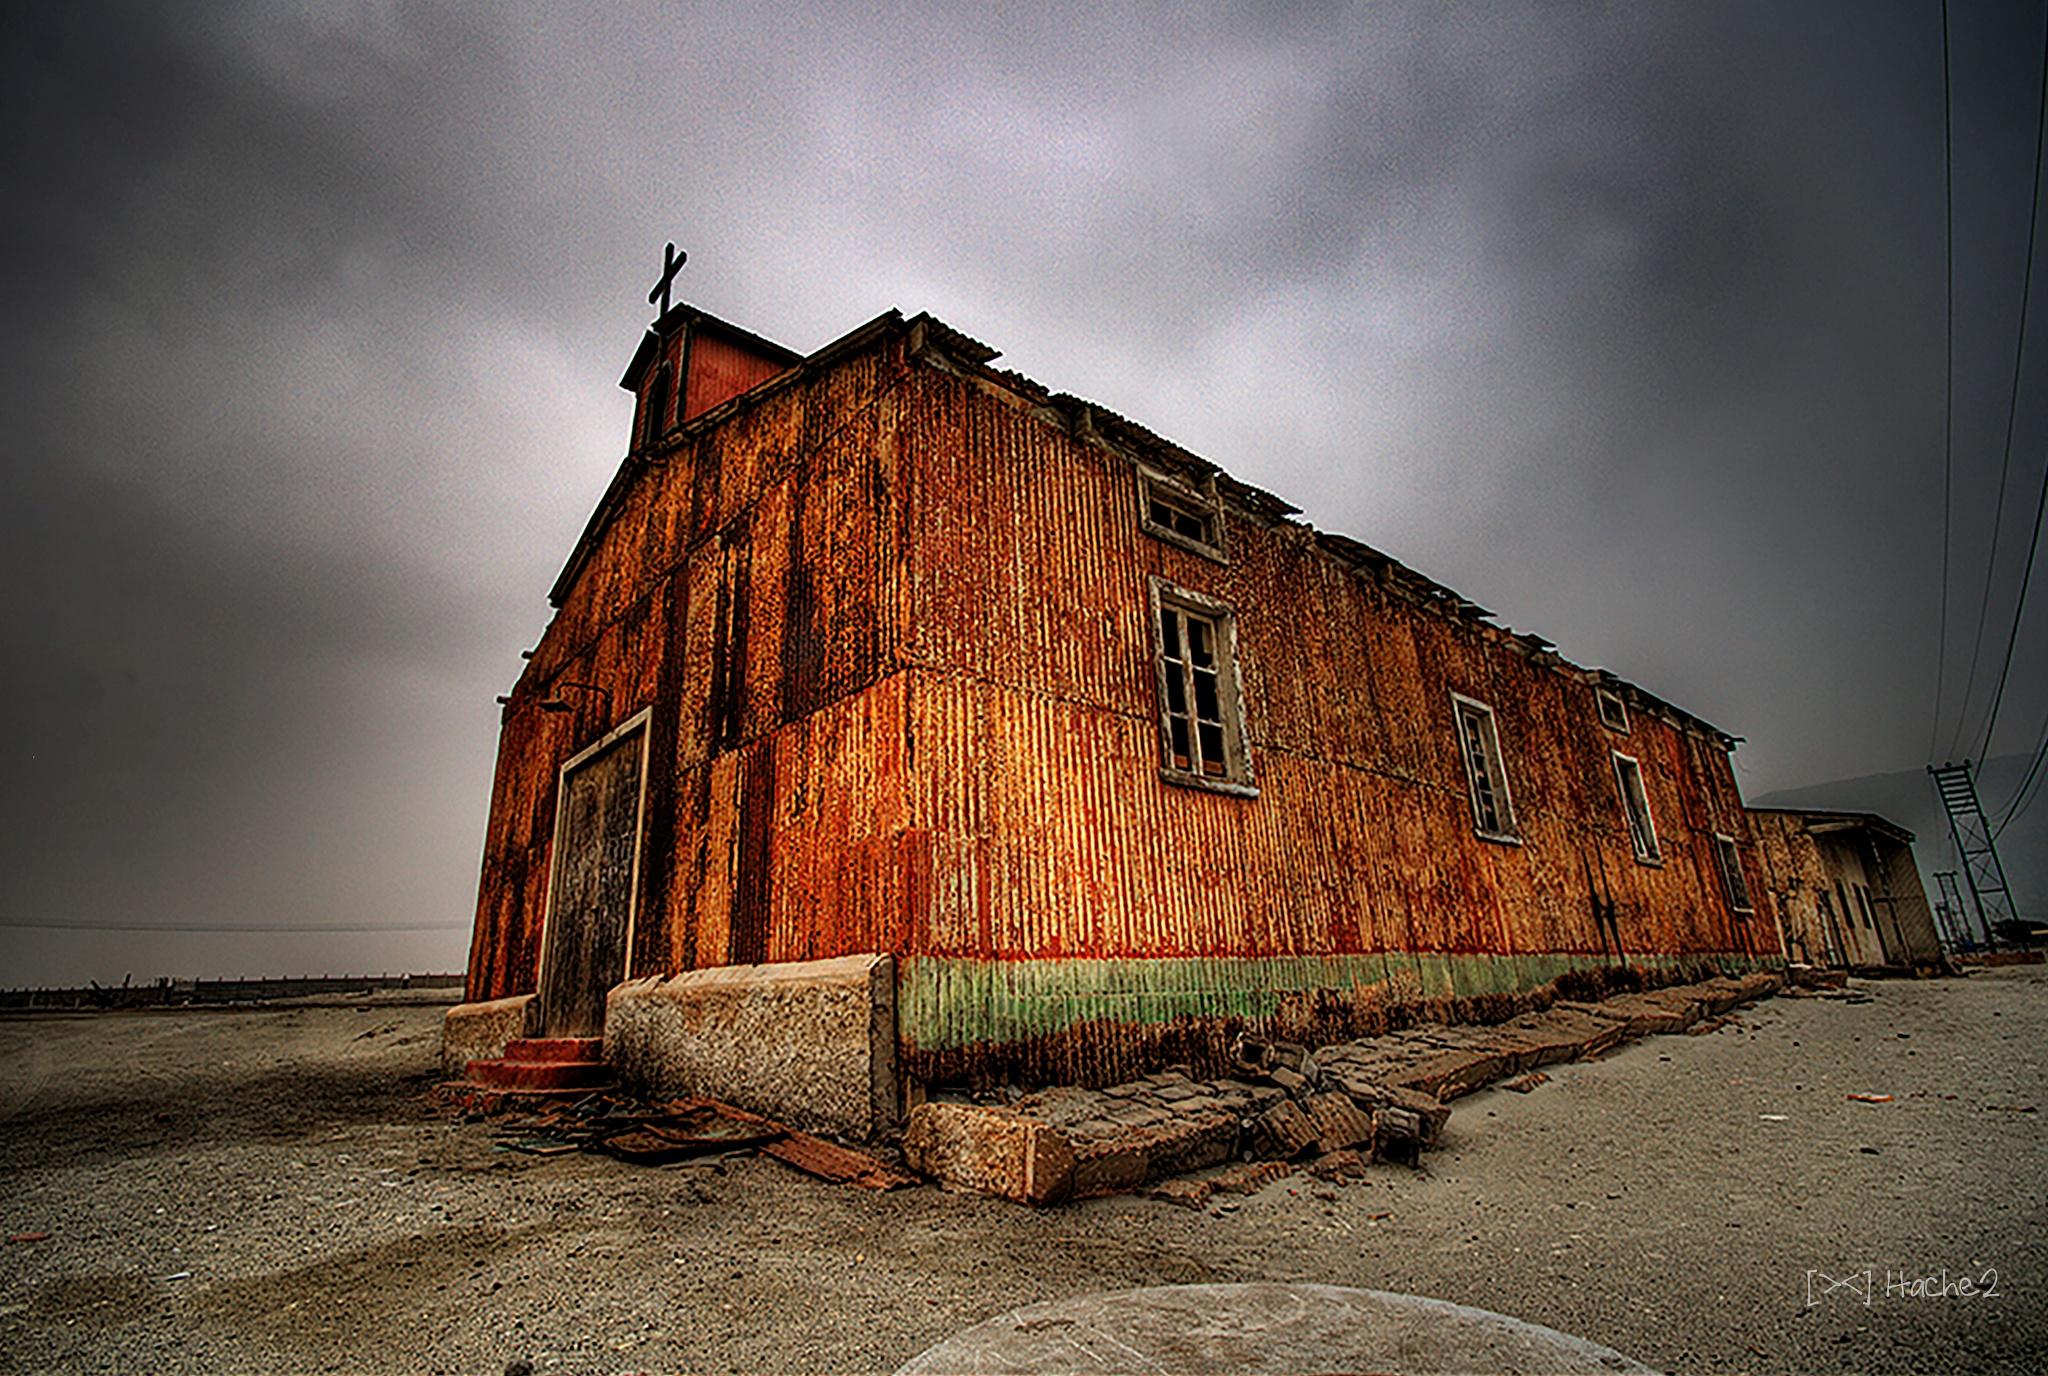 Iglesia abandonada by Hugh Honeyman